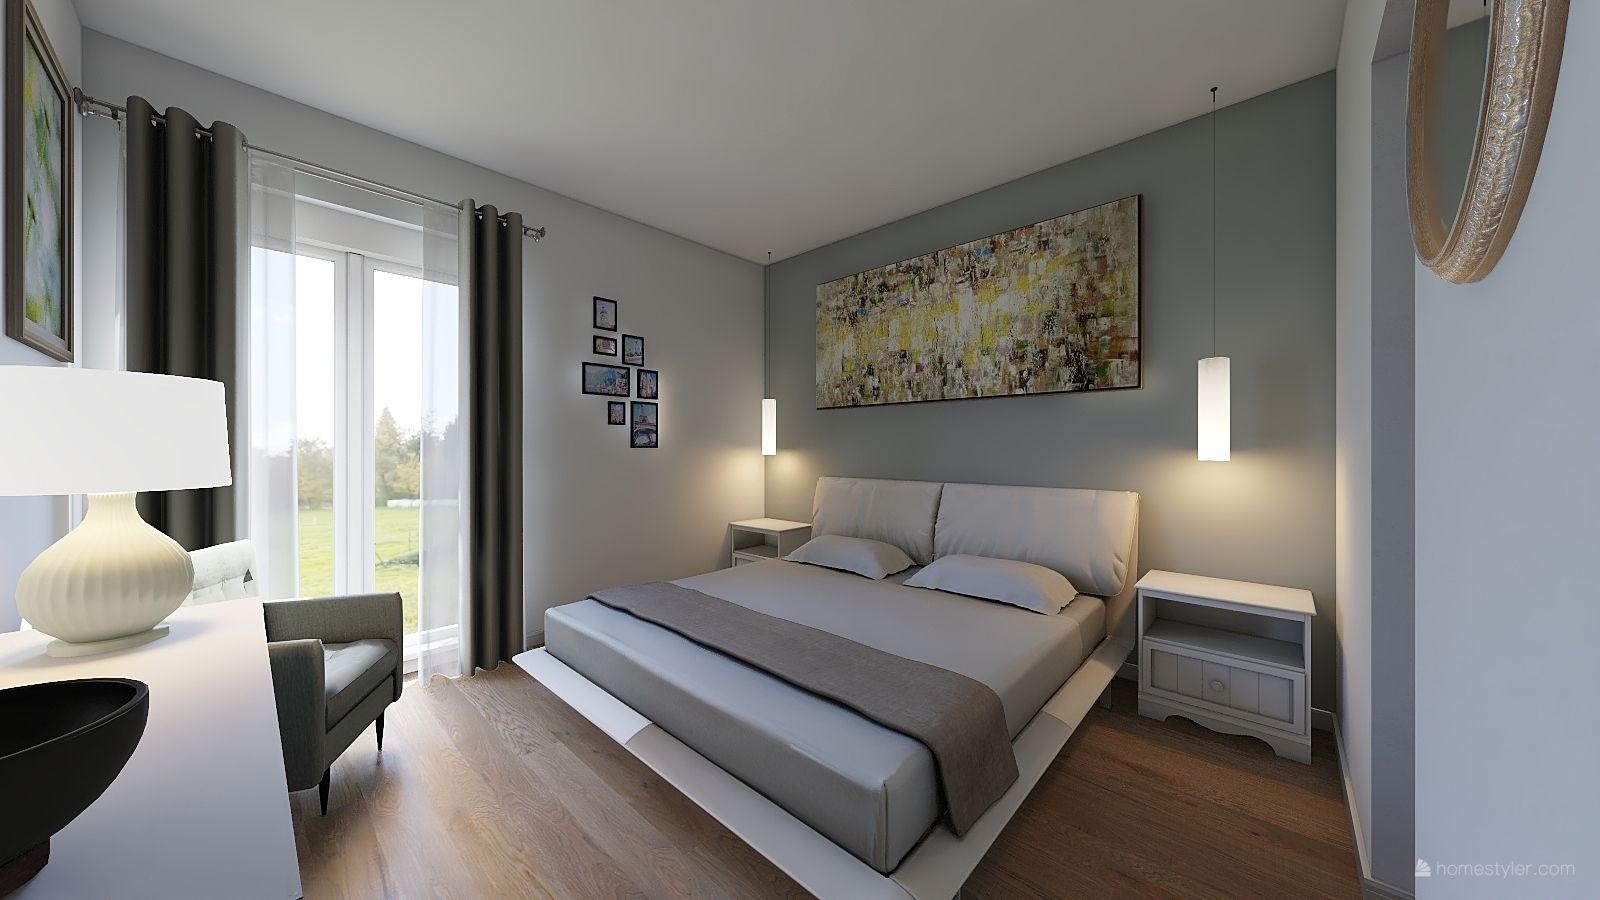 Bedroom design by Claudia Figalli #interior #bedroom in 2019 ...